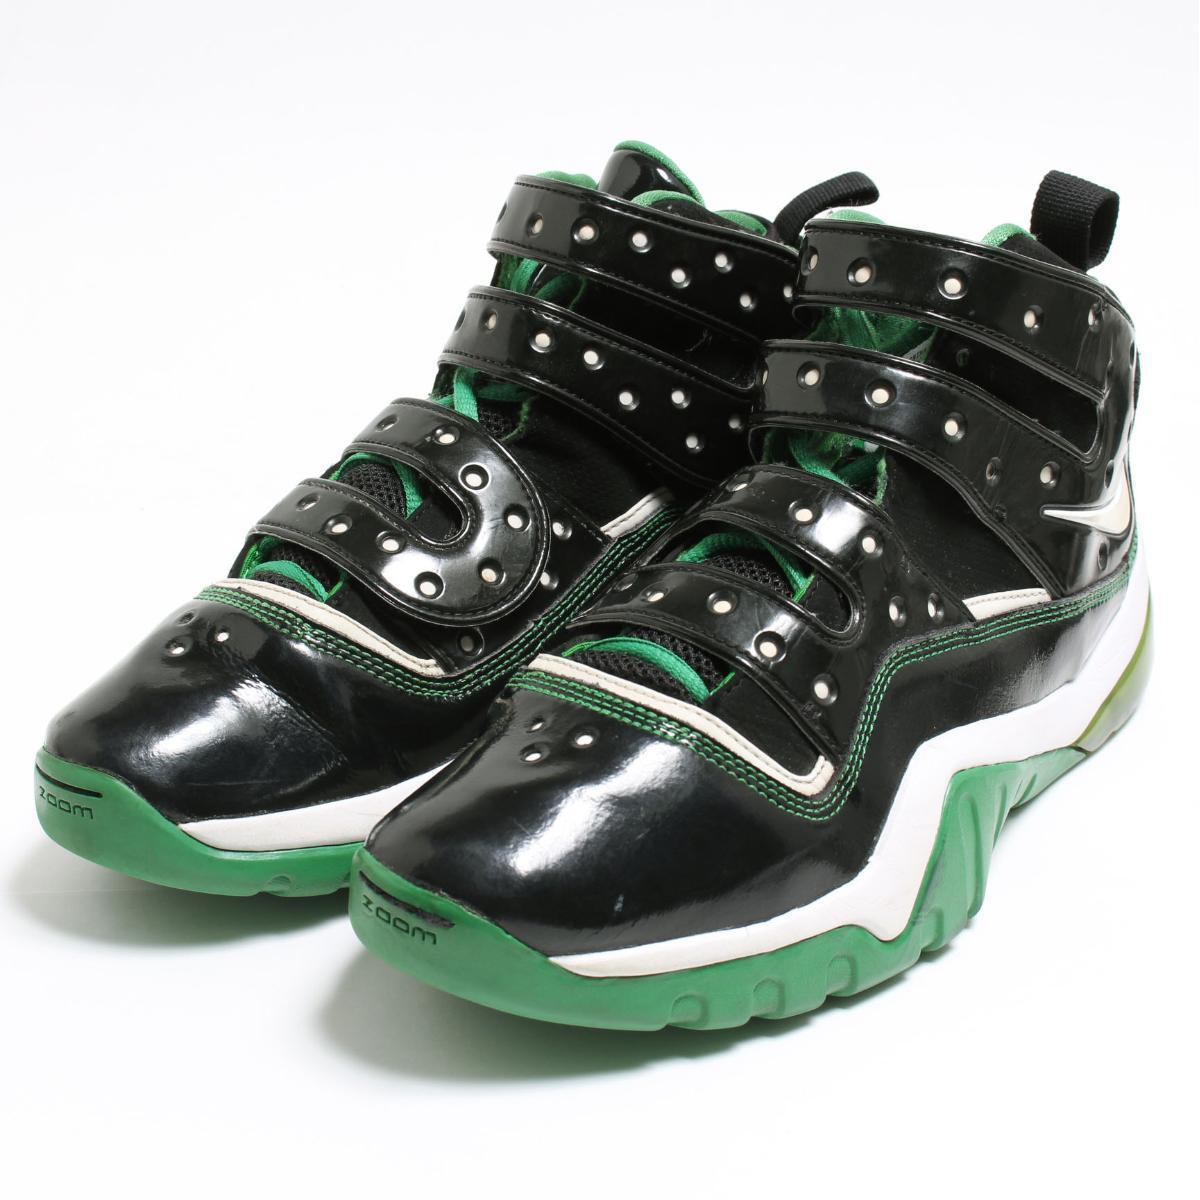 VINTAGE CLOTHING JAM  Nike NIKE Zoom Sharkley Premium sneakers US9 ... d304dda687a4